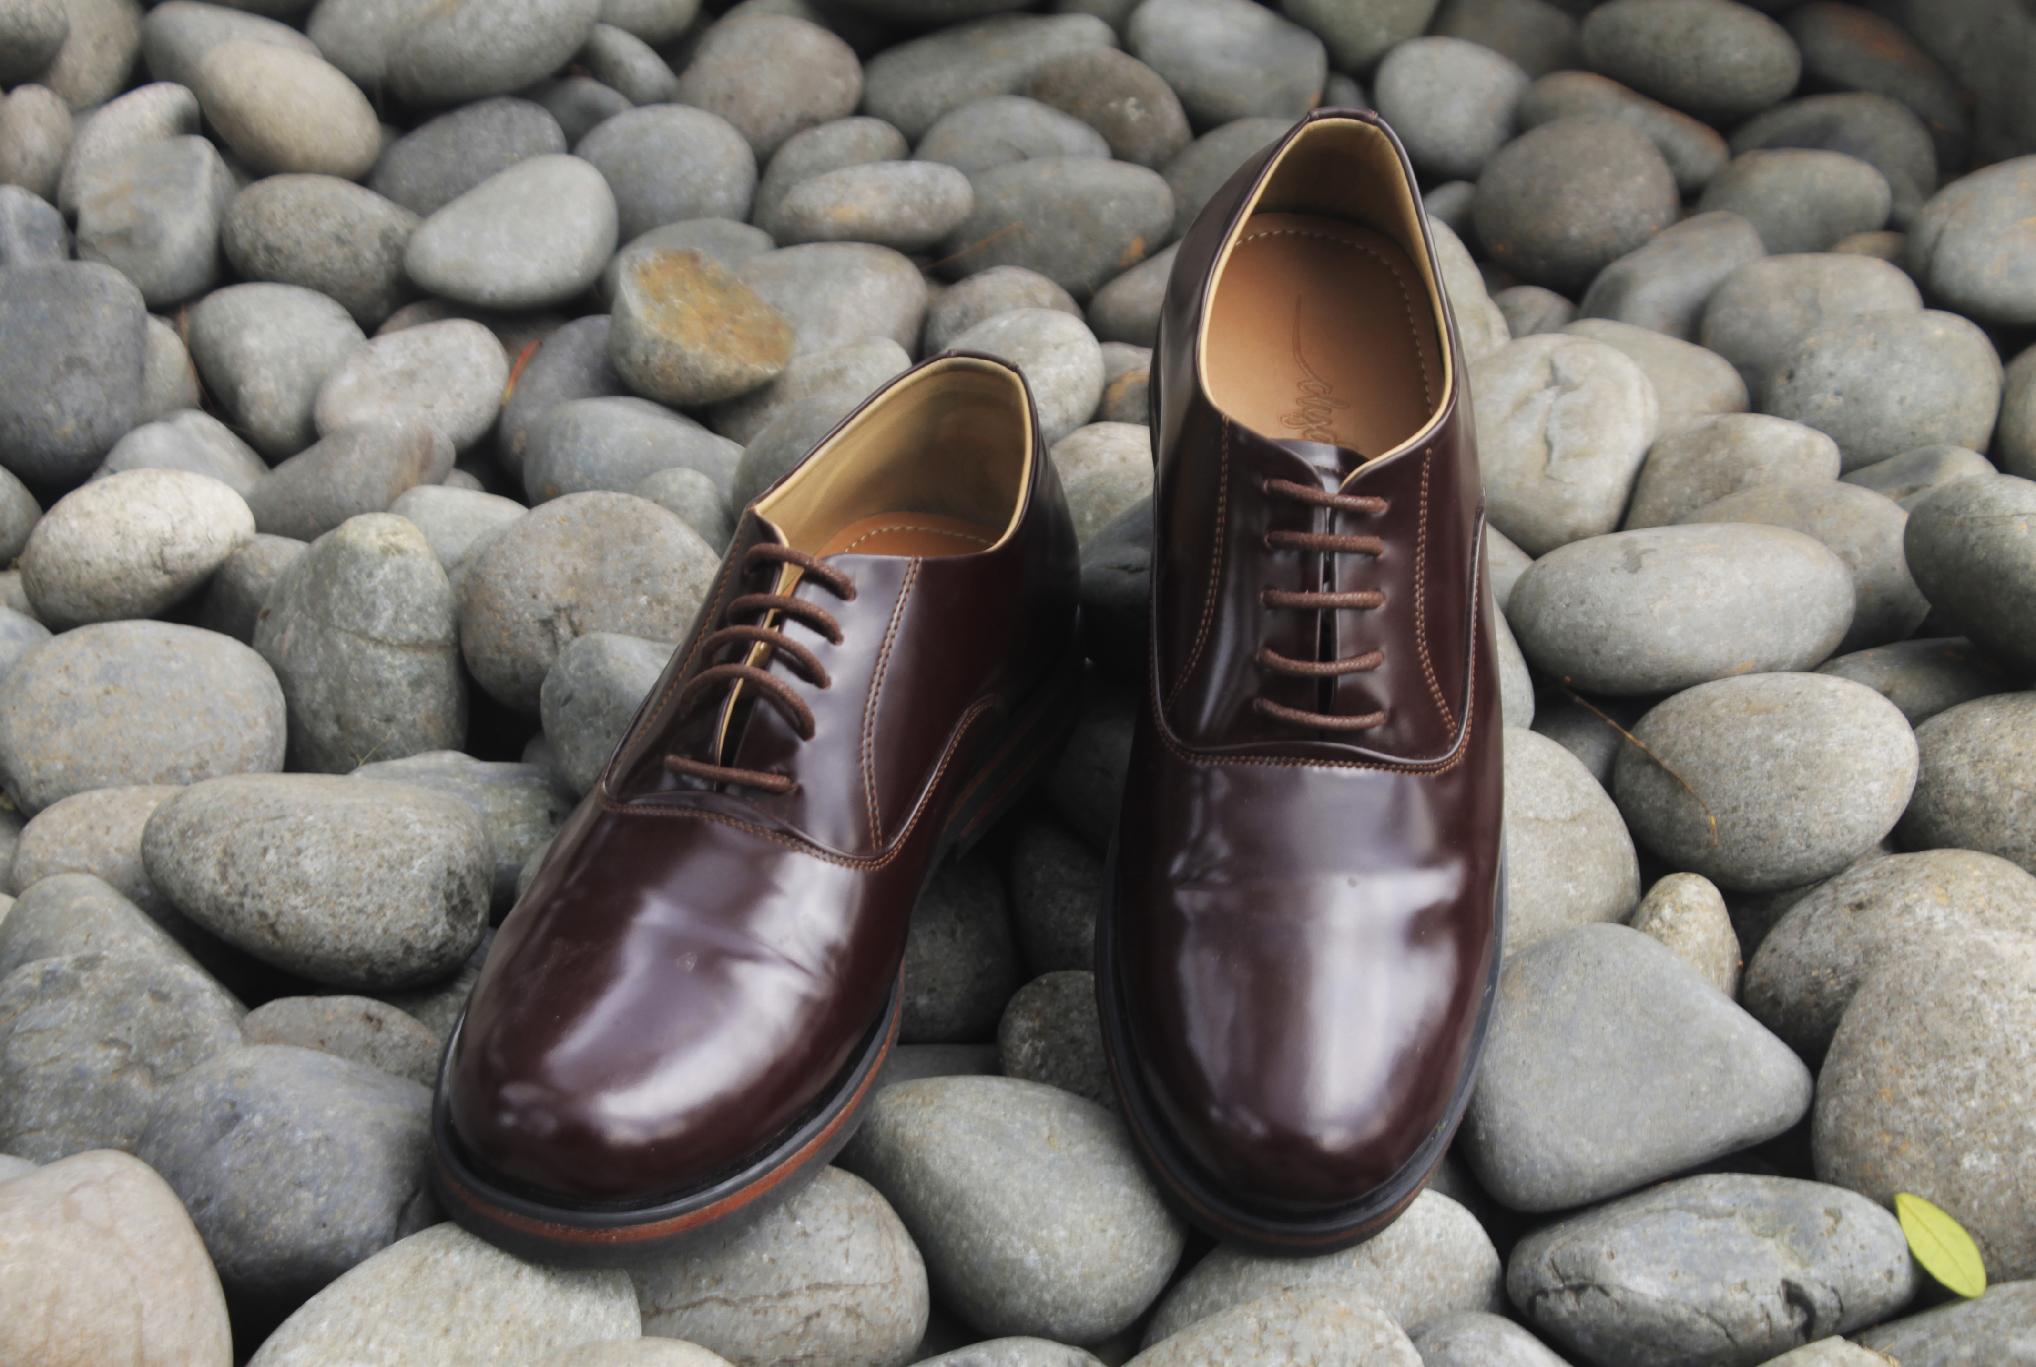 Jual Sepatu Oxford kulit – Make your impression exclusive